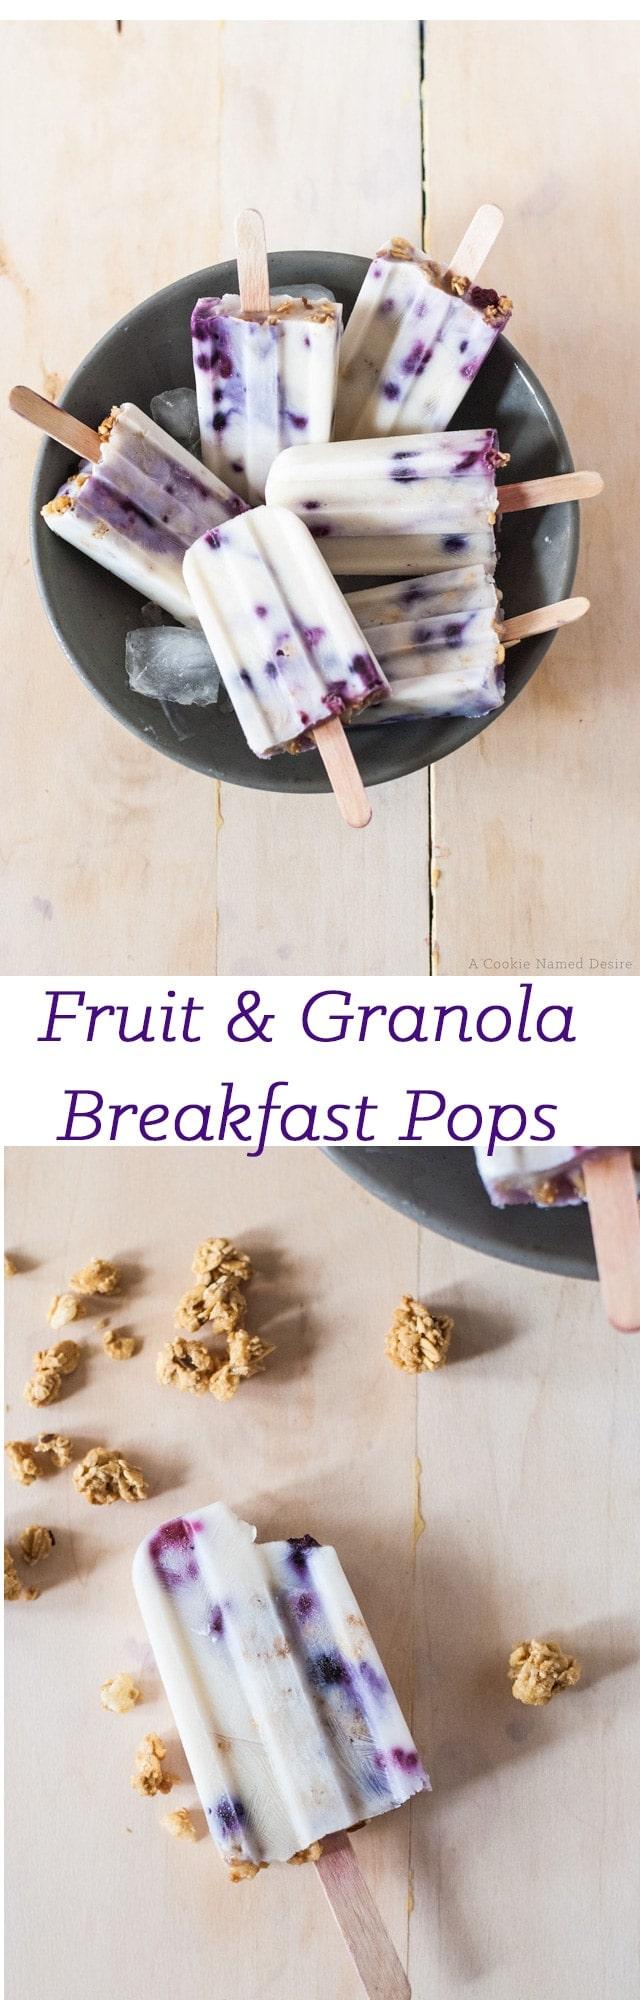 fruit and granola breakfast pops